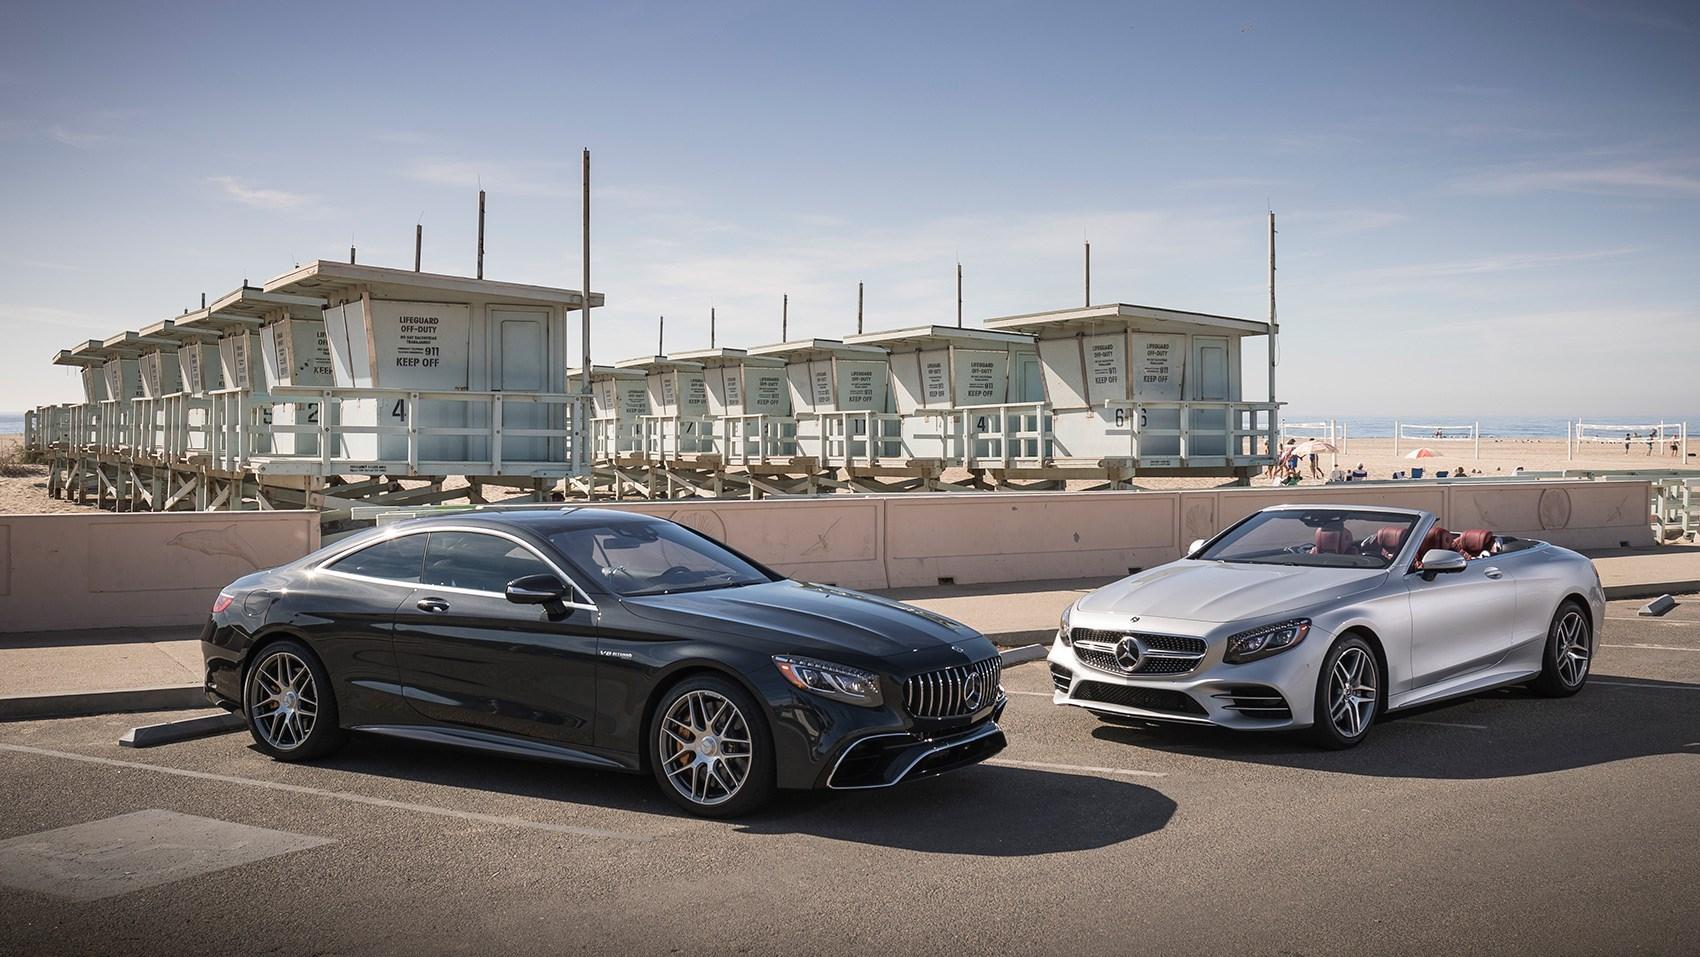 Mercedes S-class Cabriolet (2018) review | CAR Magazine